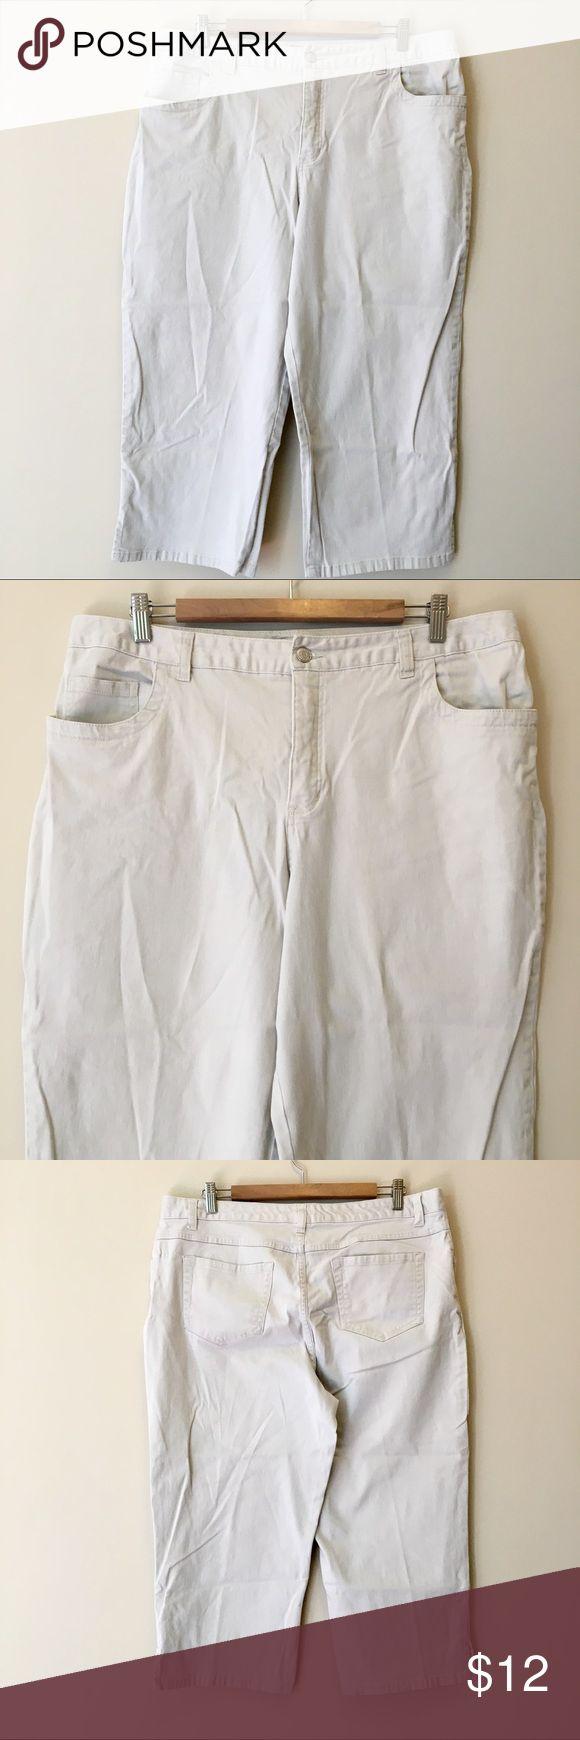 Cherokee Ivory Khaki Capris Ivory khaki capri pants by Cherokee brand.  Size 16.  Excellent condition! Cherokee Pants Capris